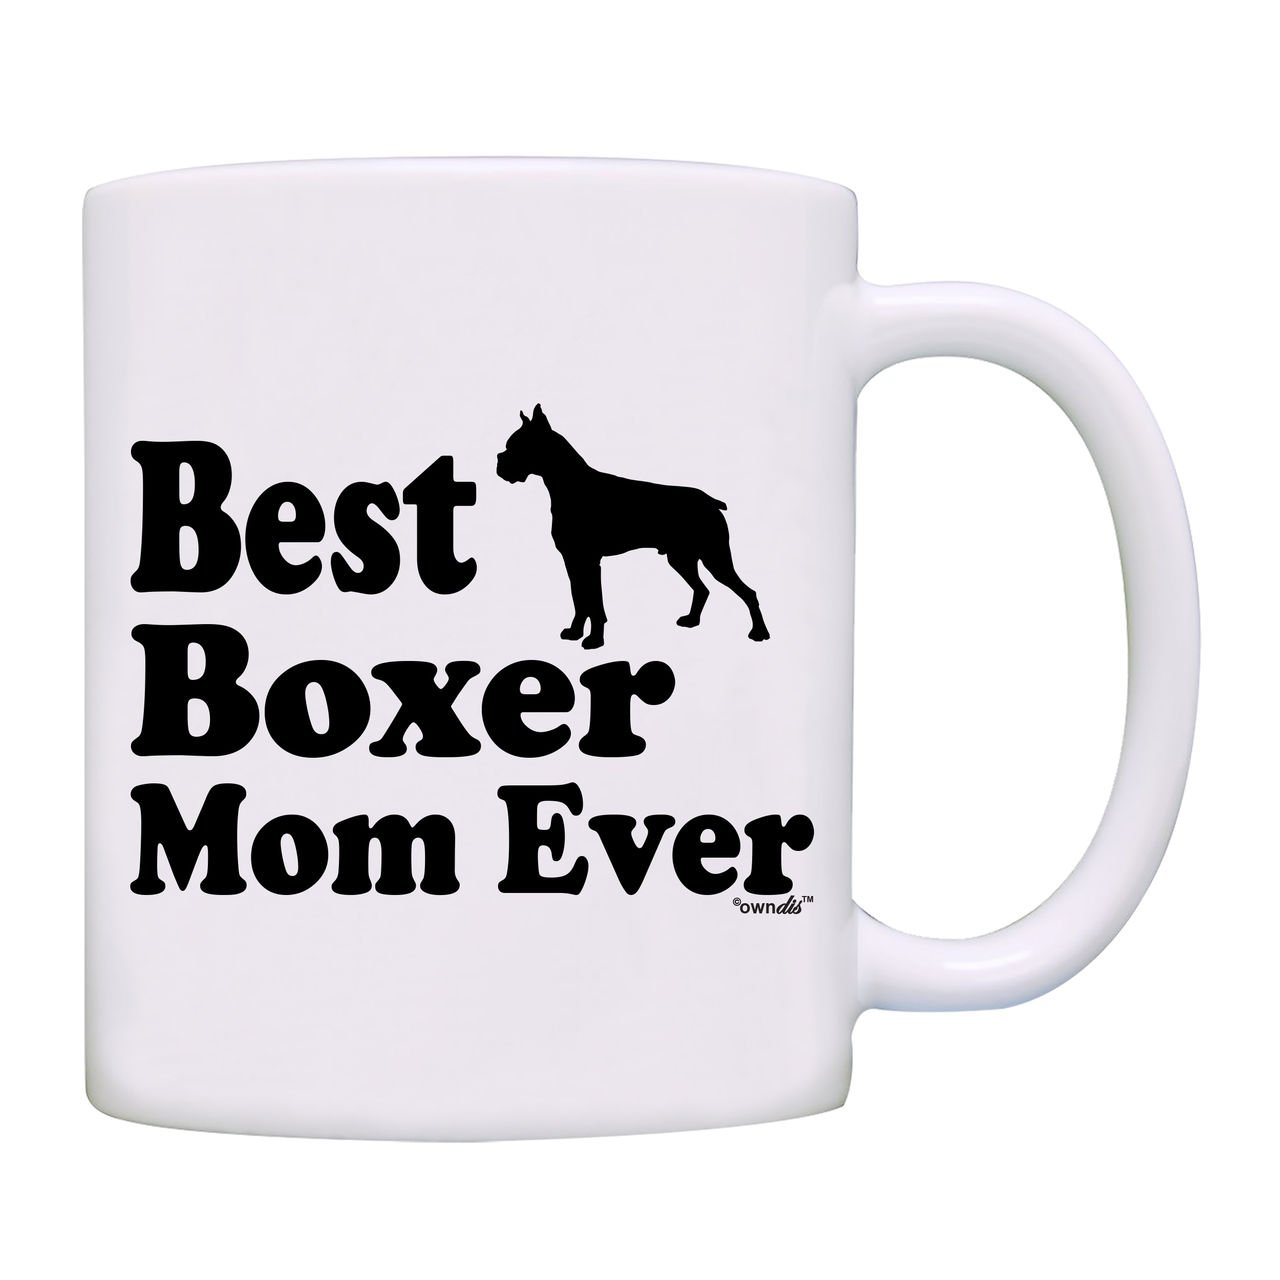 Mug Best Boxer Mom Ever Gift Coffee Mug-0082-White